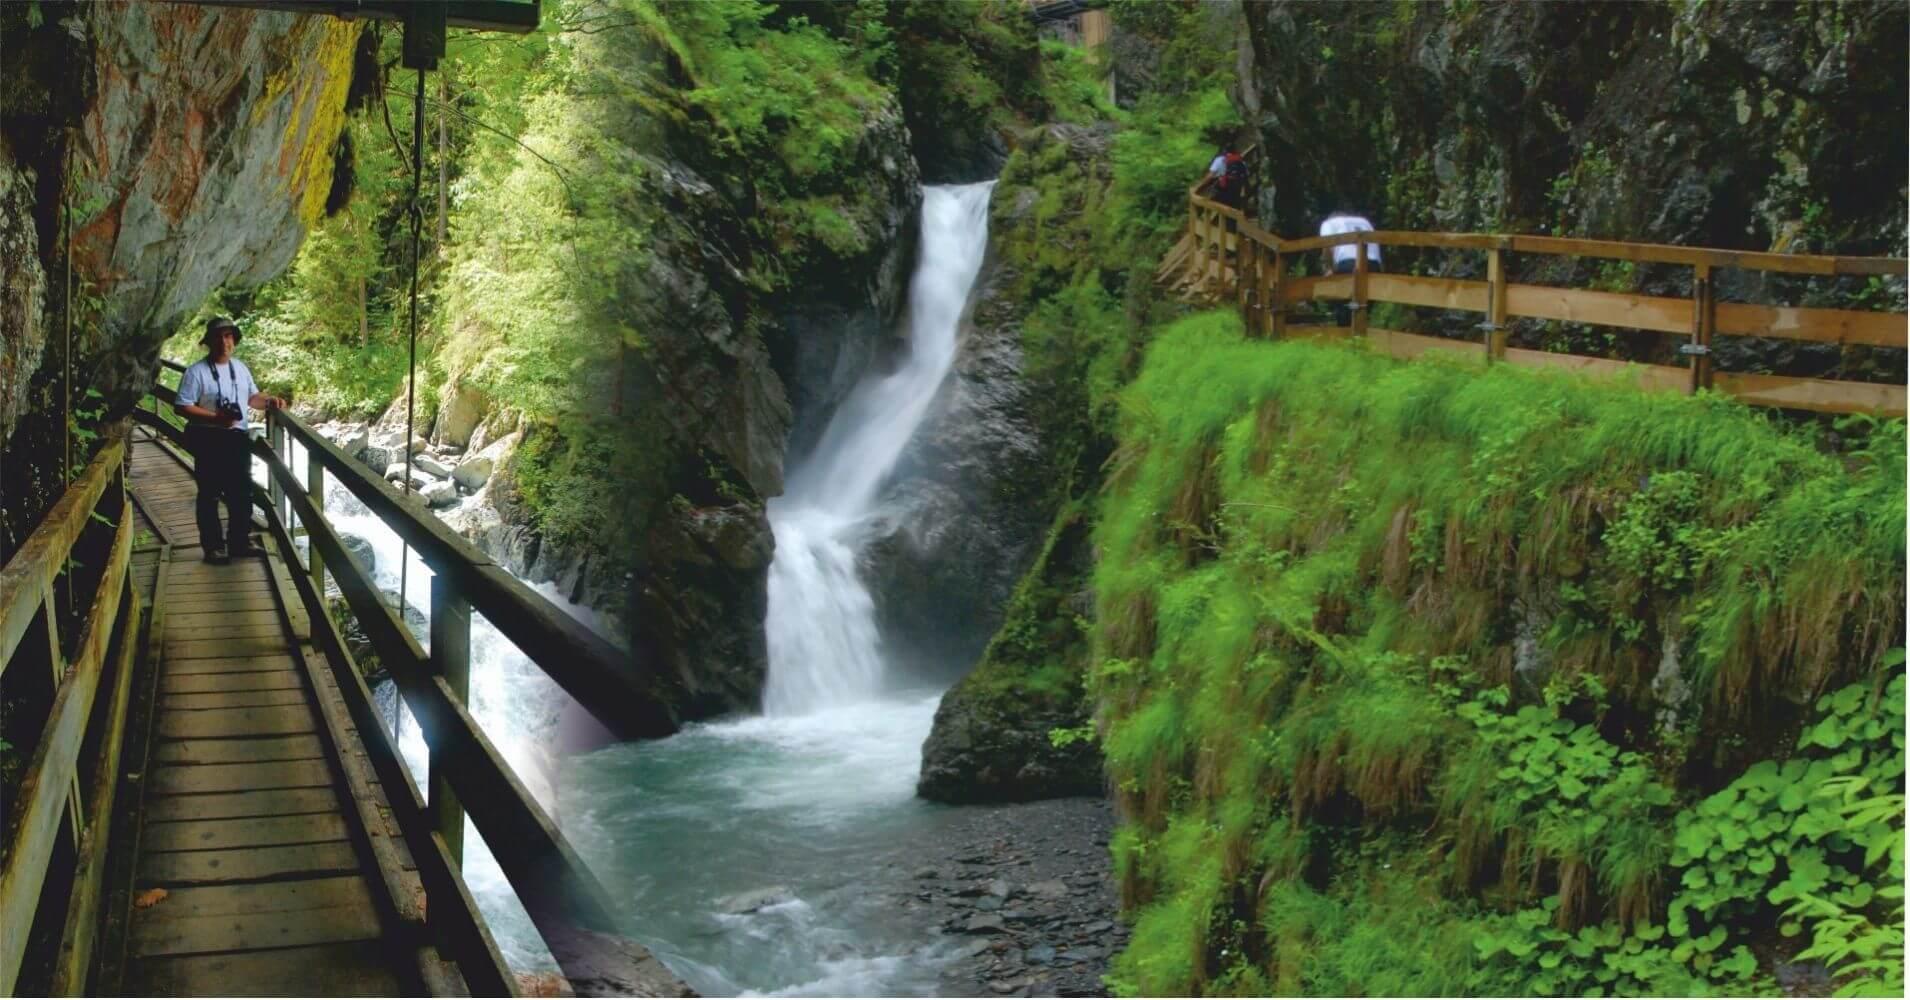 Pasarelas y Cascadas en las Gargantas. Alta Saboya. Auvernia-Ródano-Alpes, Francia.